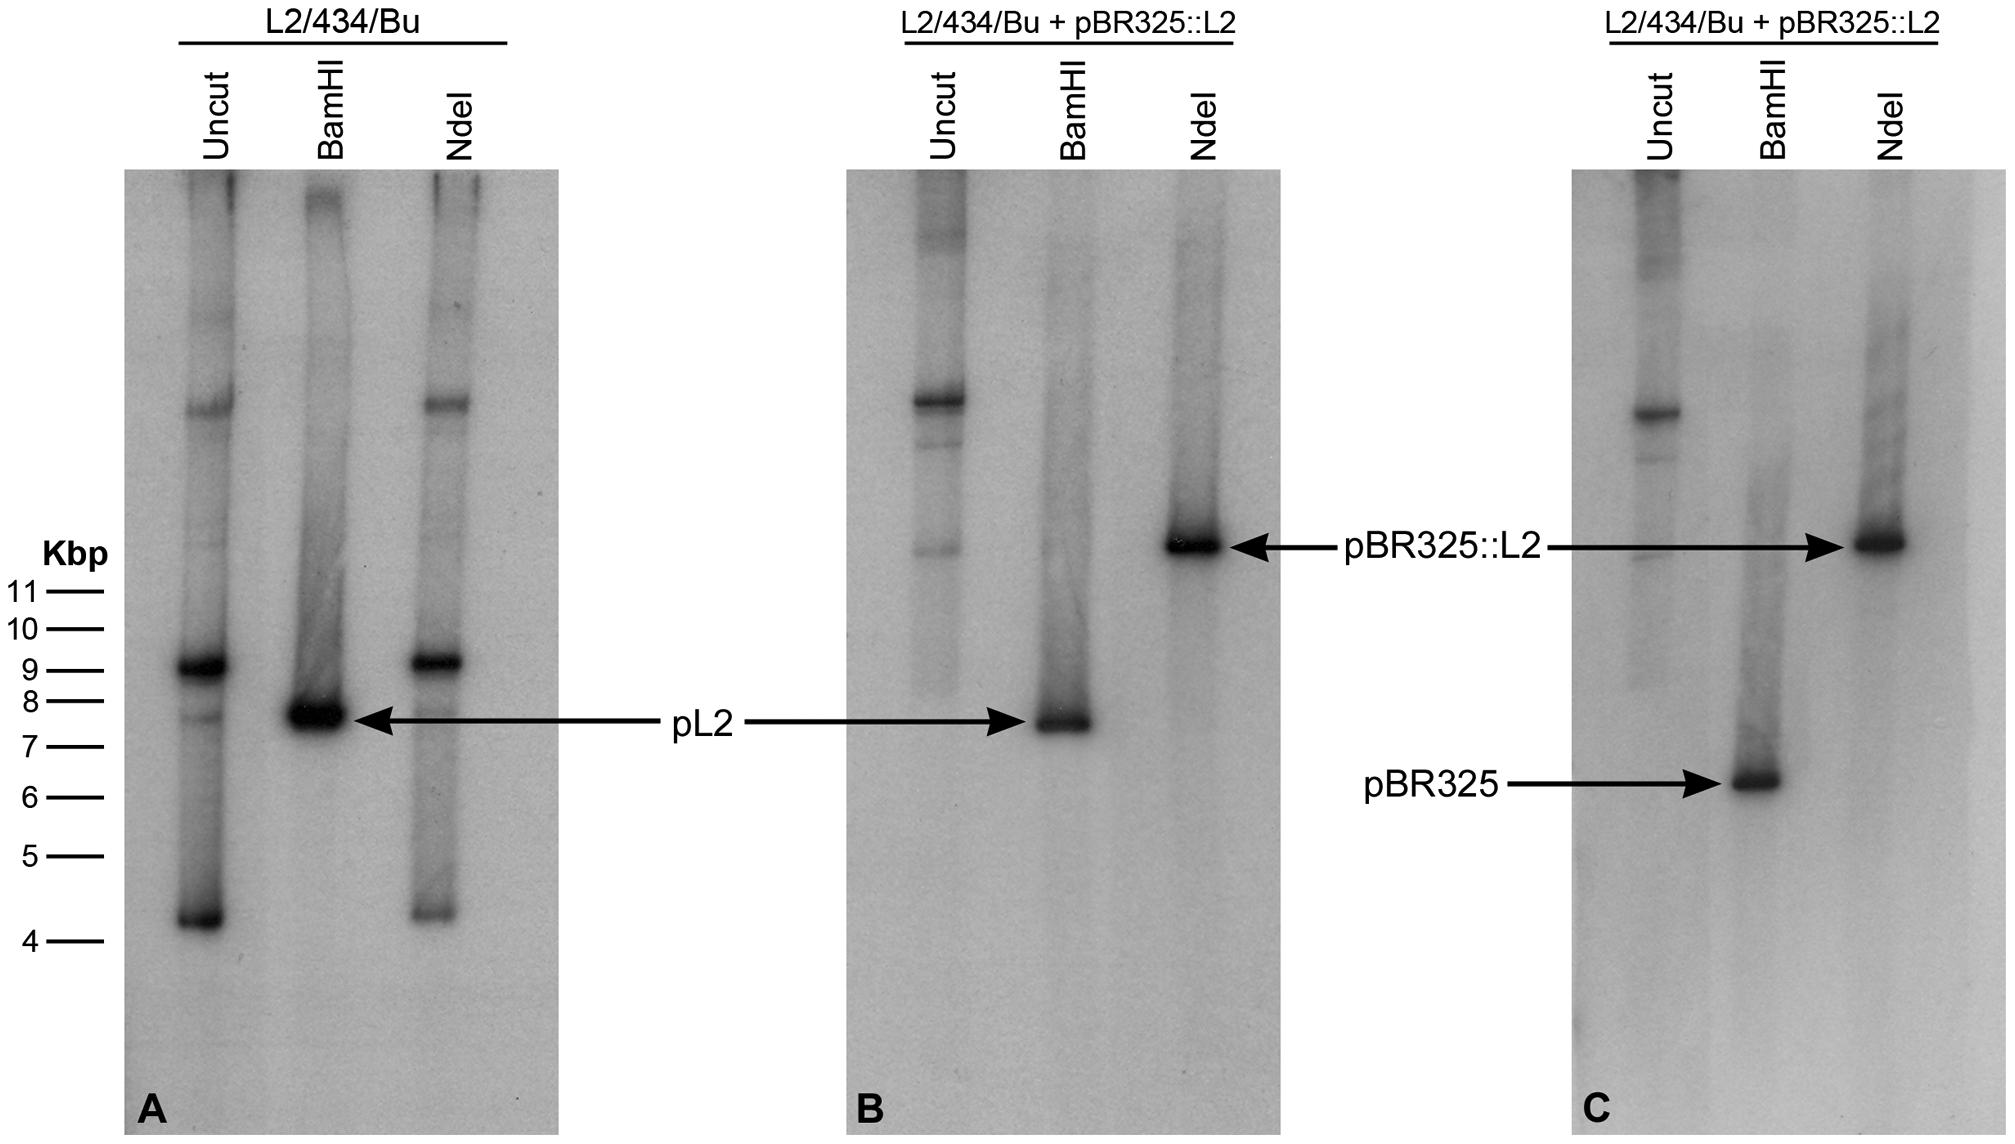 Southern blot of <i>C. trachomatis</i> L2/434/Bu transformed by plasmid pBR325::L2.